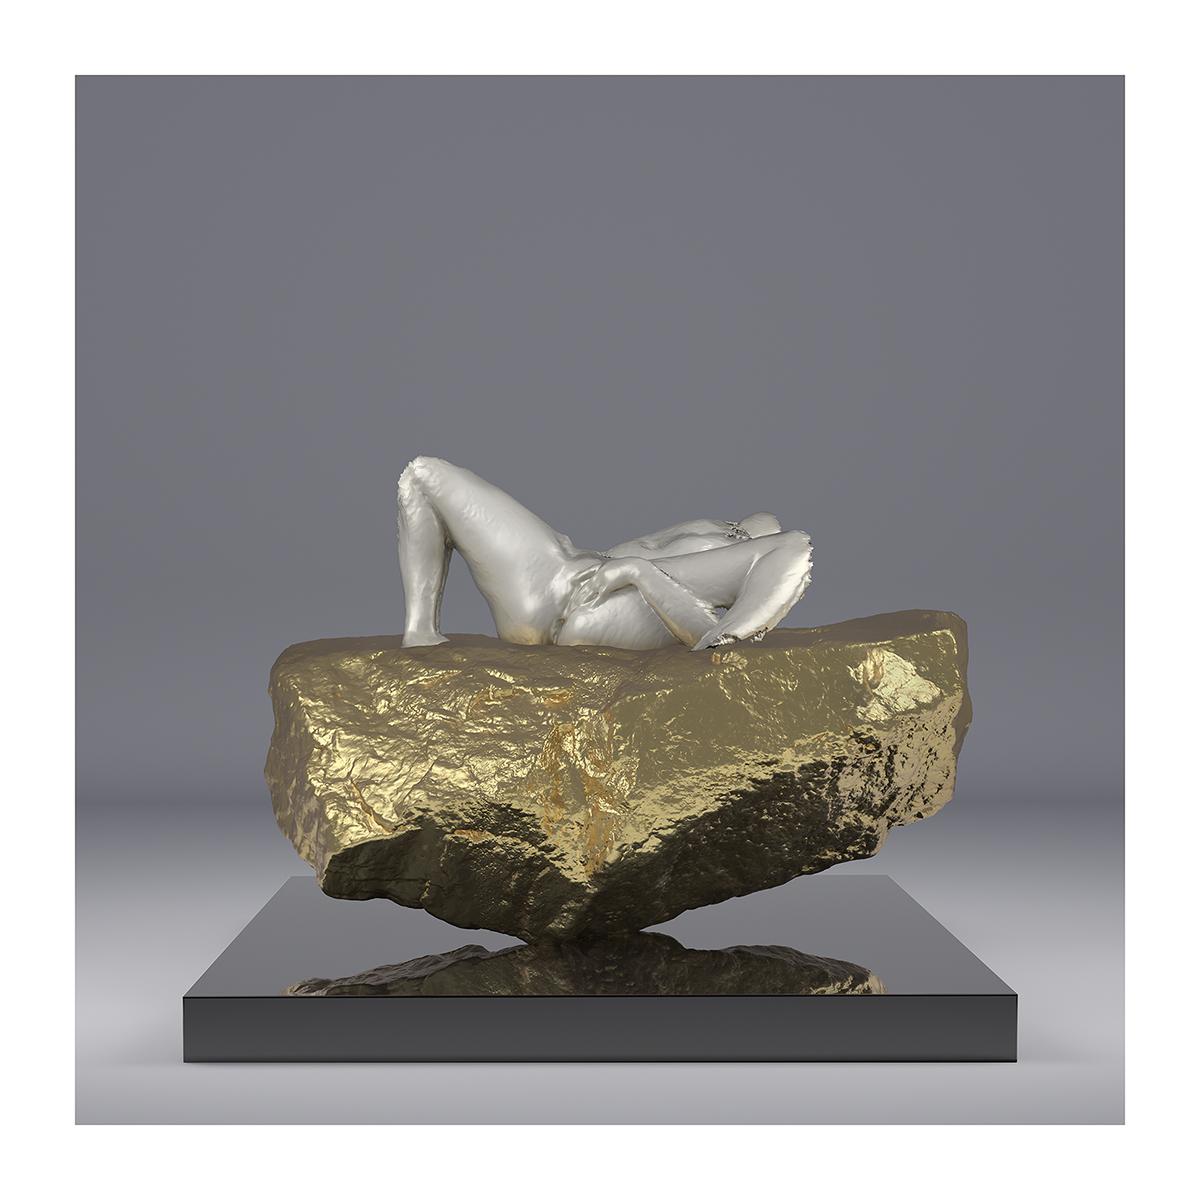 I will not Make any more Boring Art XI 003 1 - 2020 - I will not Make any more Boring Art. XI. (L'Origine Virtuelle du Monde)